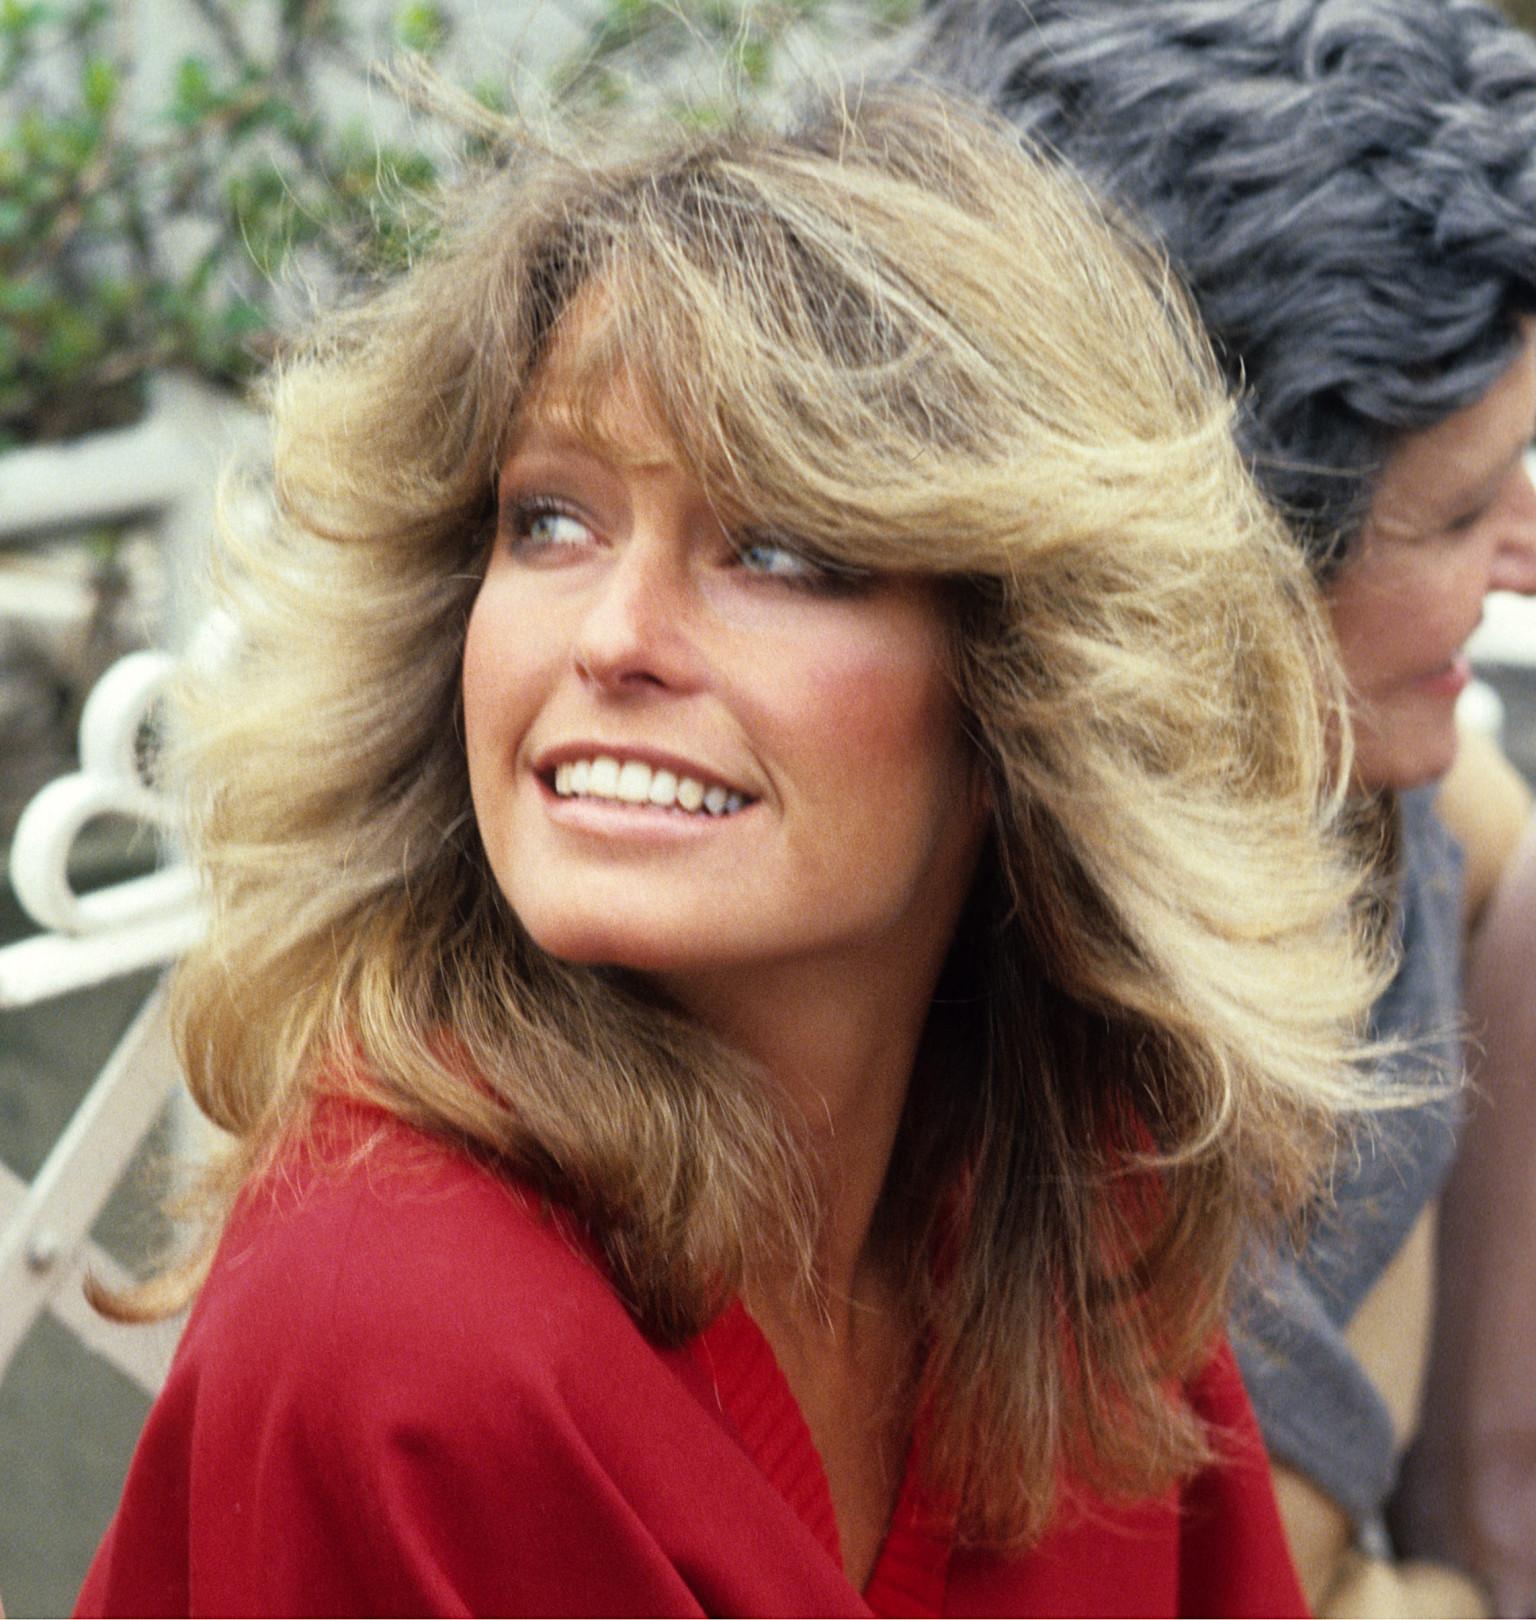 farrah fawcett death anniversary: 'charlie's angels' actress died